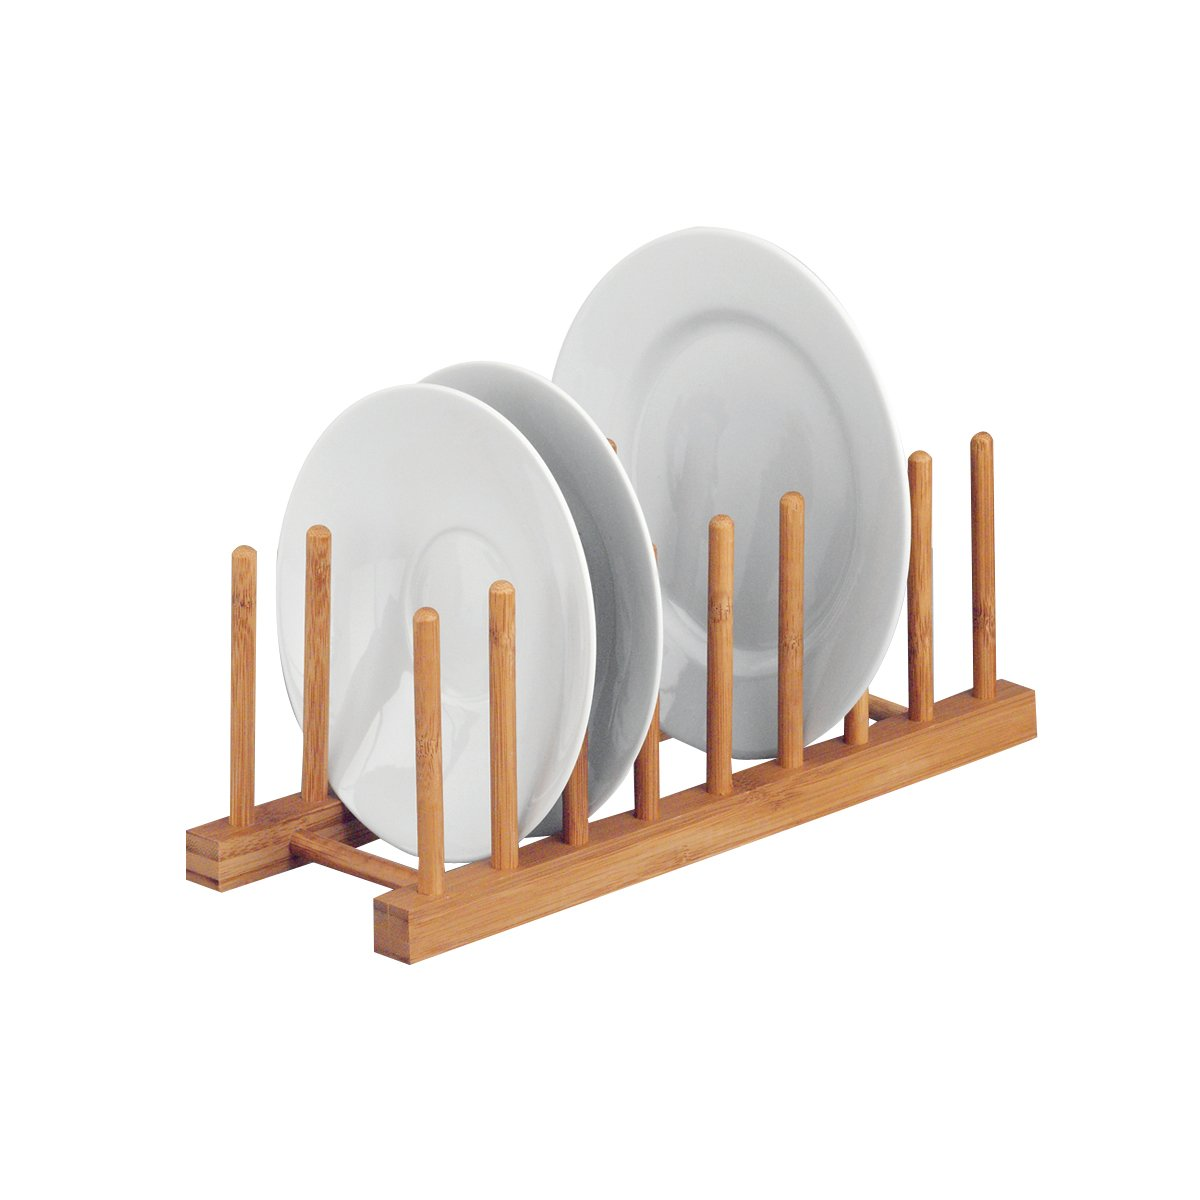 Zeller 25278 Supporto per Piatti, Bambú , Beige, 34x12.5x12 cm Bambú